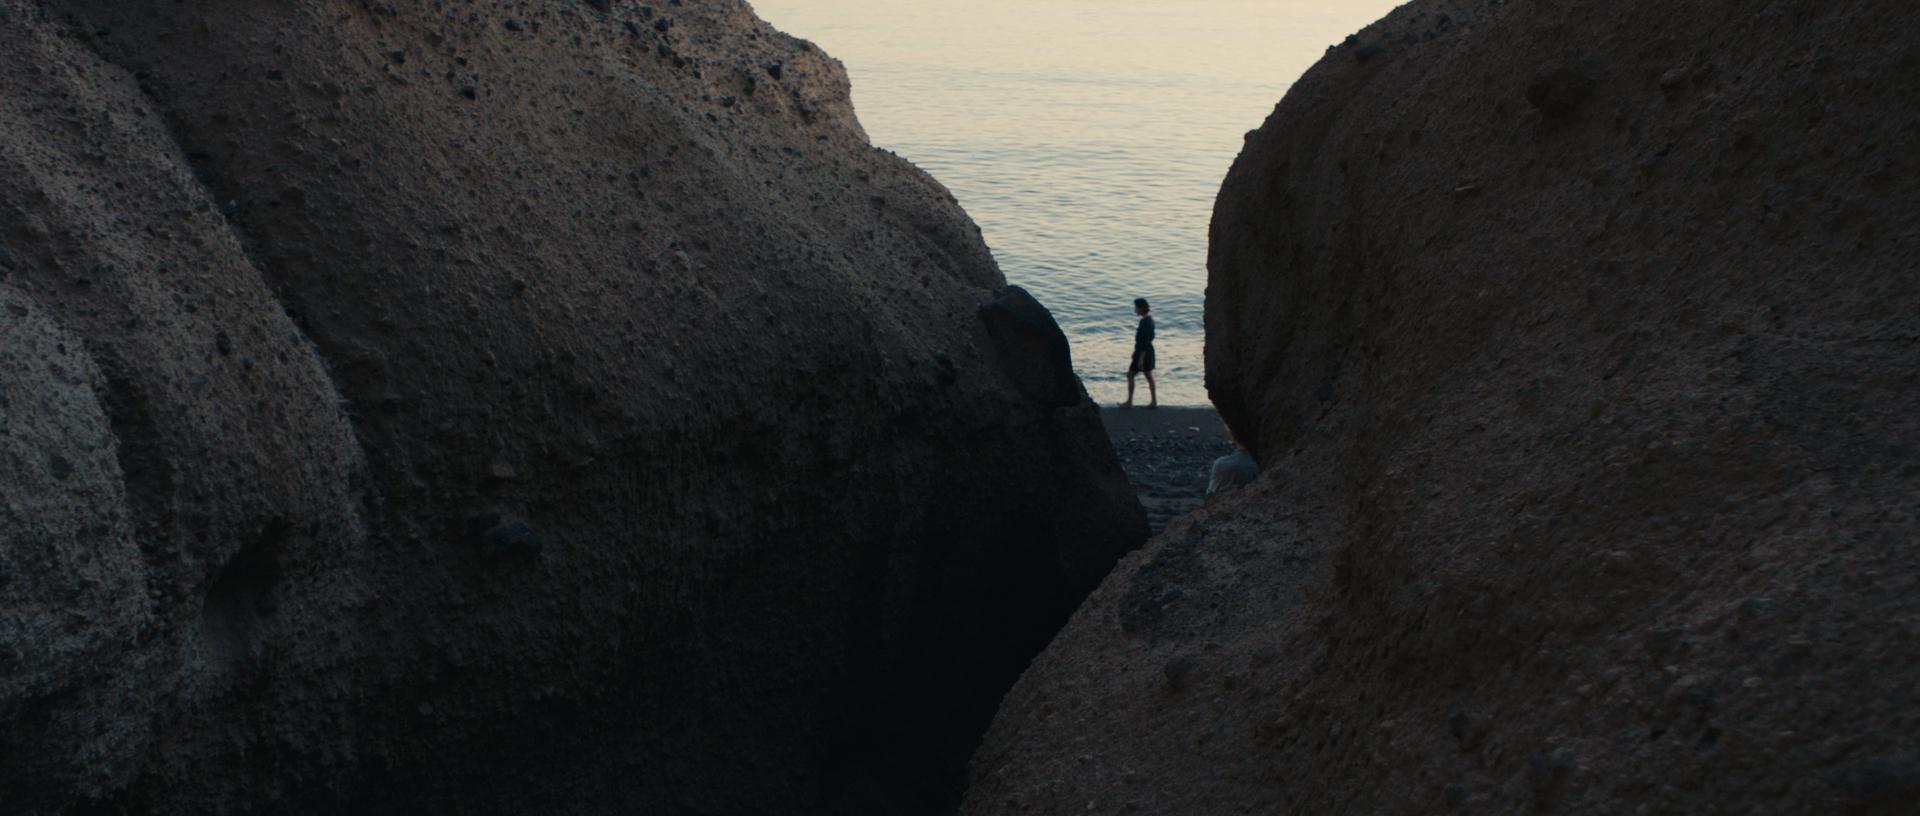 Fünf Seen Filmfestival 2017